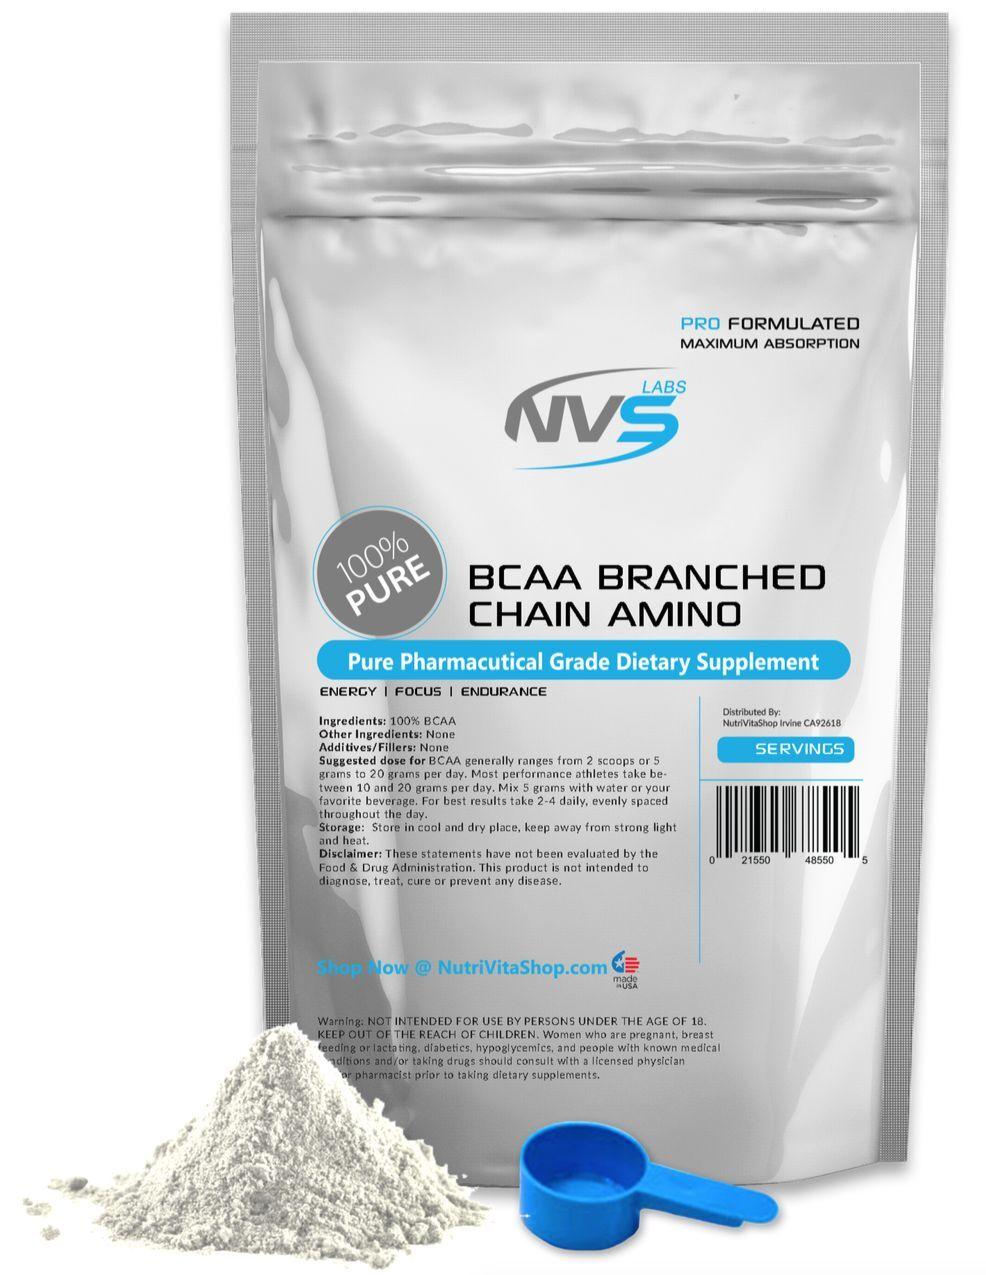 260ml Acides 250 G Nvs Ramifiée Acides 260ml Aminés à Chaîne fc6bec